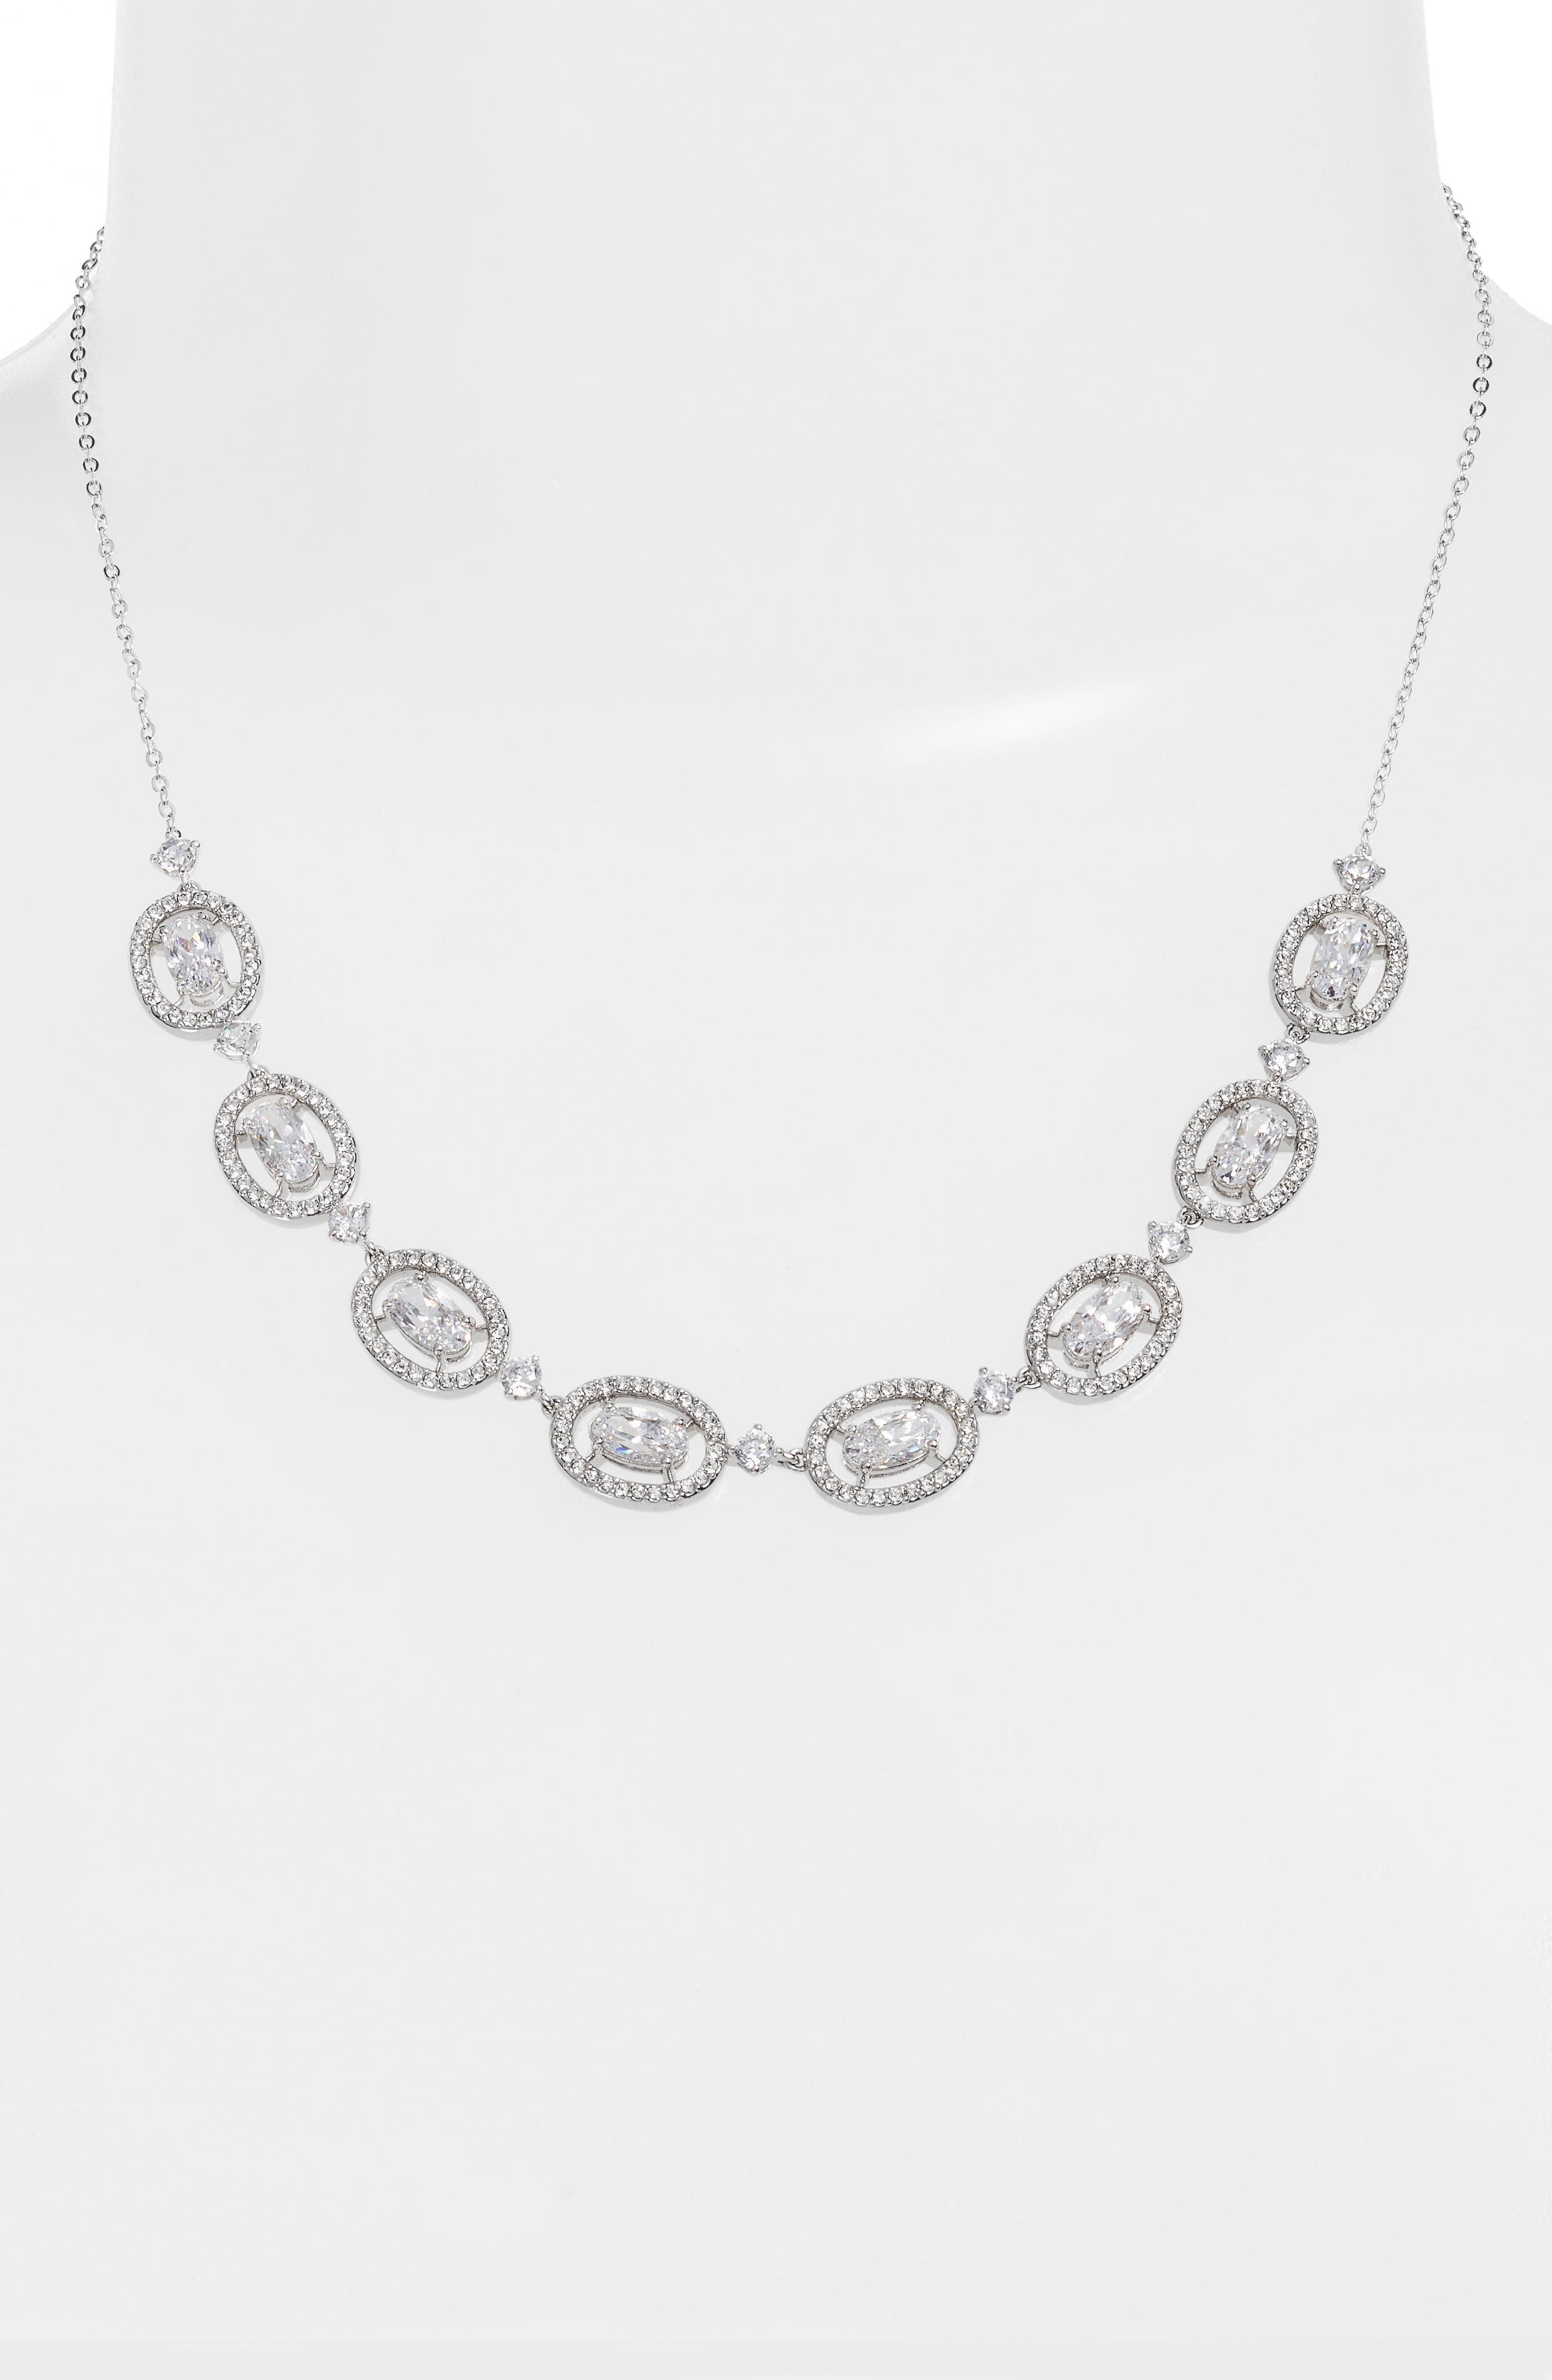 Main Image - Nadri Frontal Necklace